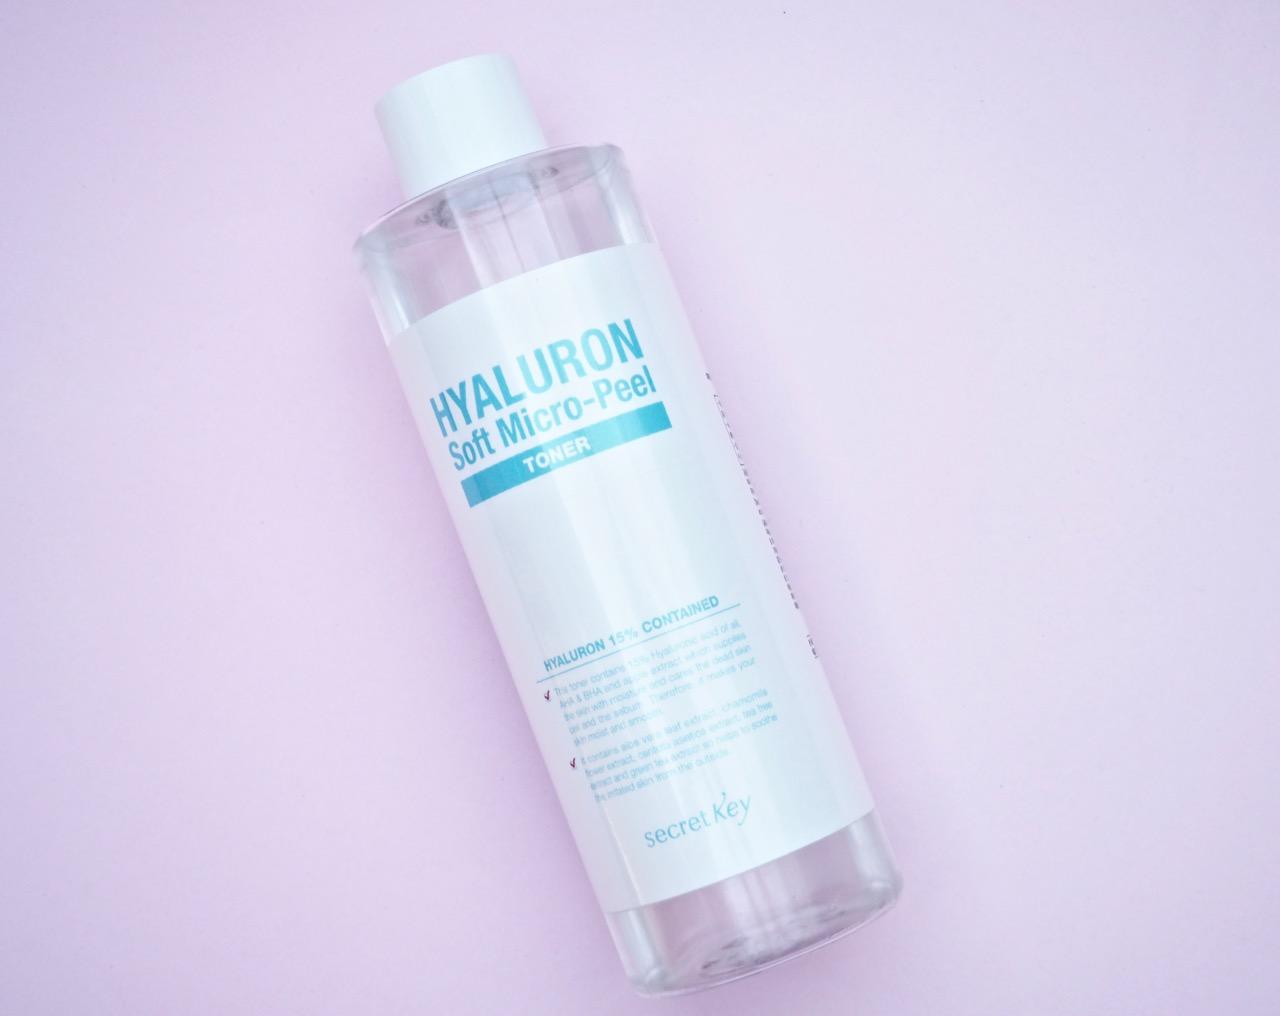 Secret Key Hyaluron Soft Micro-Peel Toner kasvovesi korealainen kokemuksia Ostolakossa Virve Vee